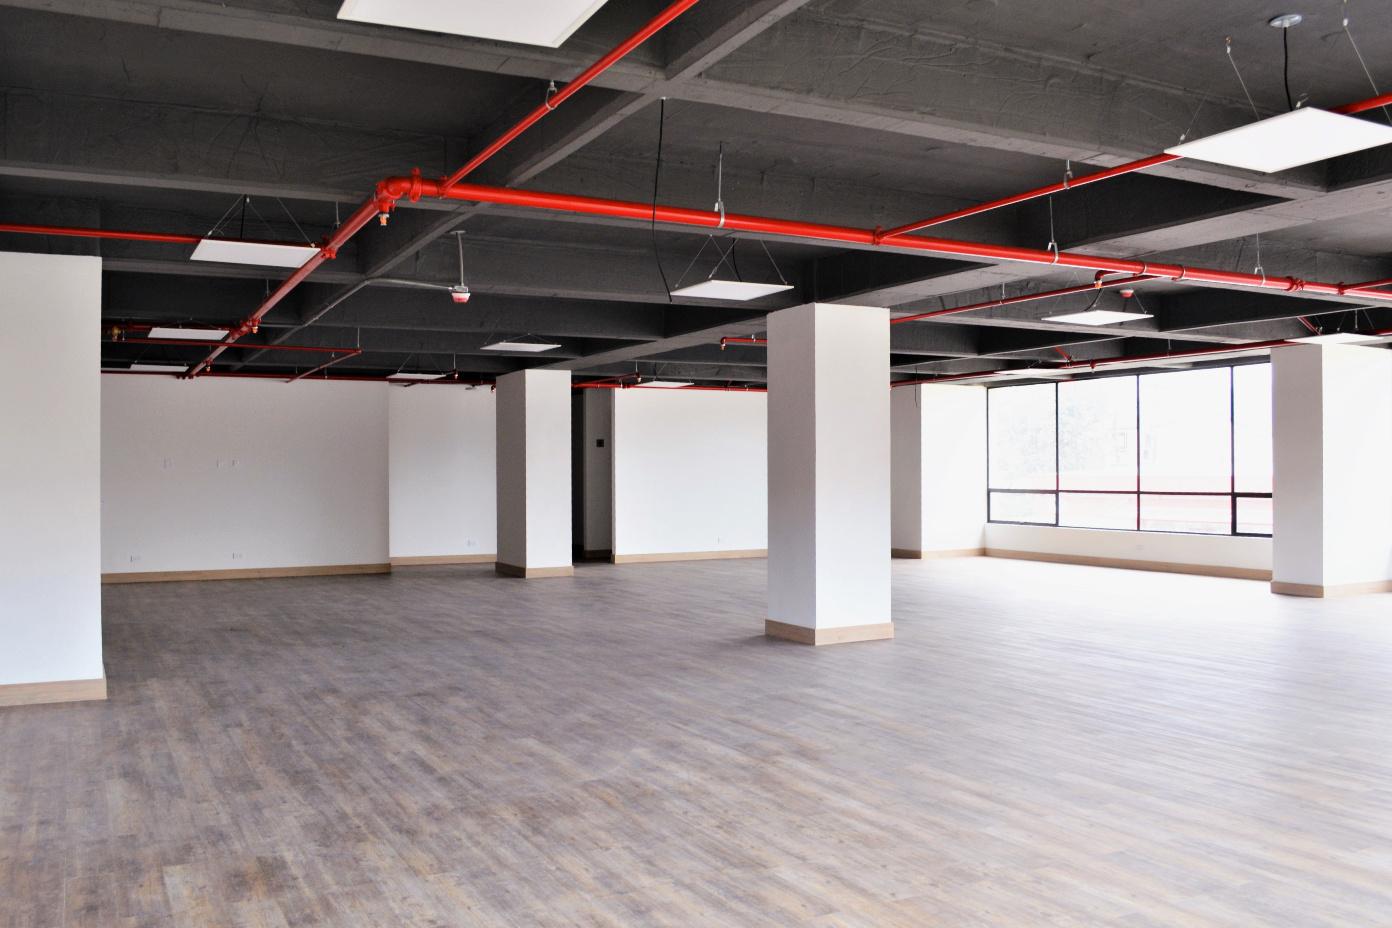 Sala de lectura - Club House - Torres de Timiza, apartamentos en venta, sector Kennedy, Bogotá, vivienda de interés social VIS, aplica subsidio